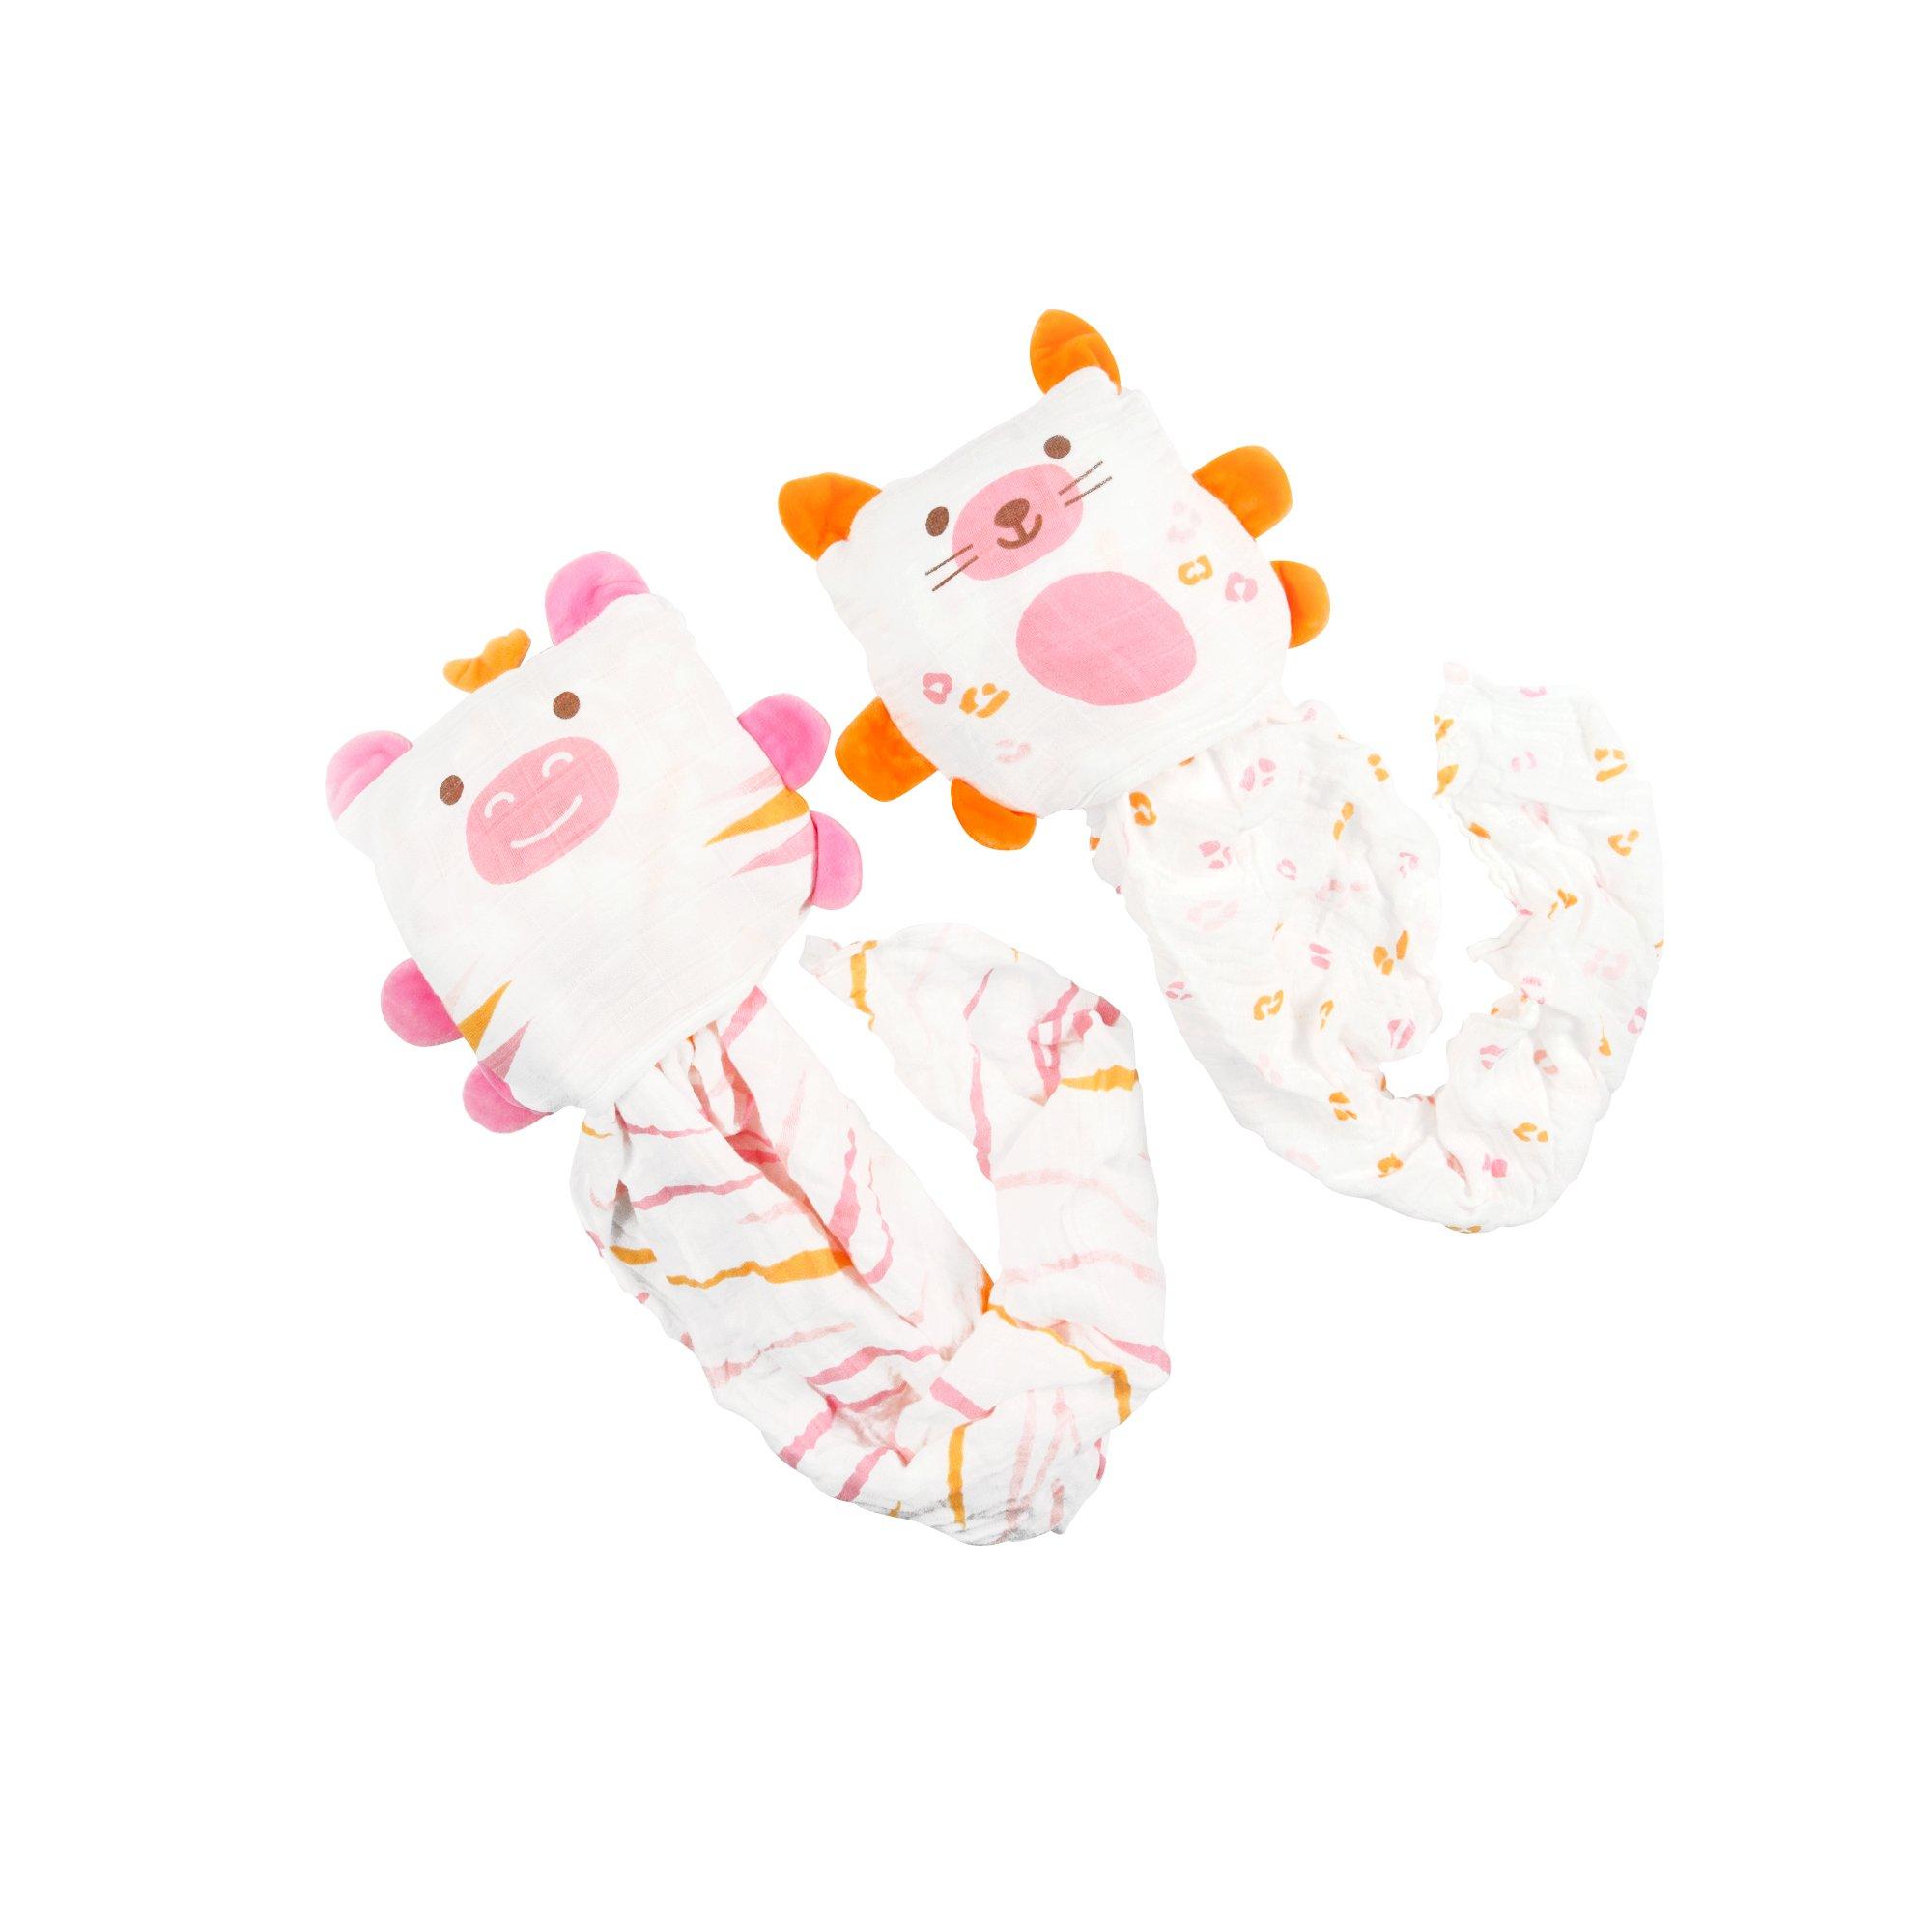 Ubbi 2-in-1 Convertible Baby Pillow and Cotton Blanket, Cheetah/Zebra